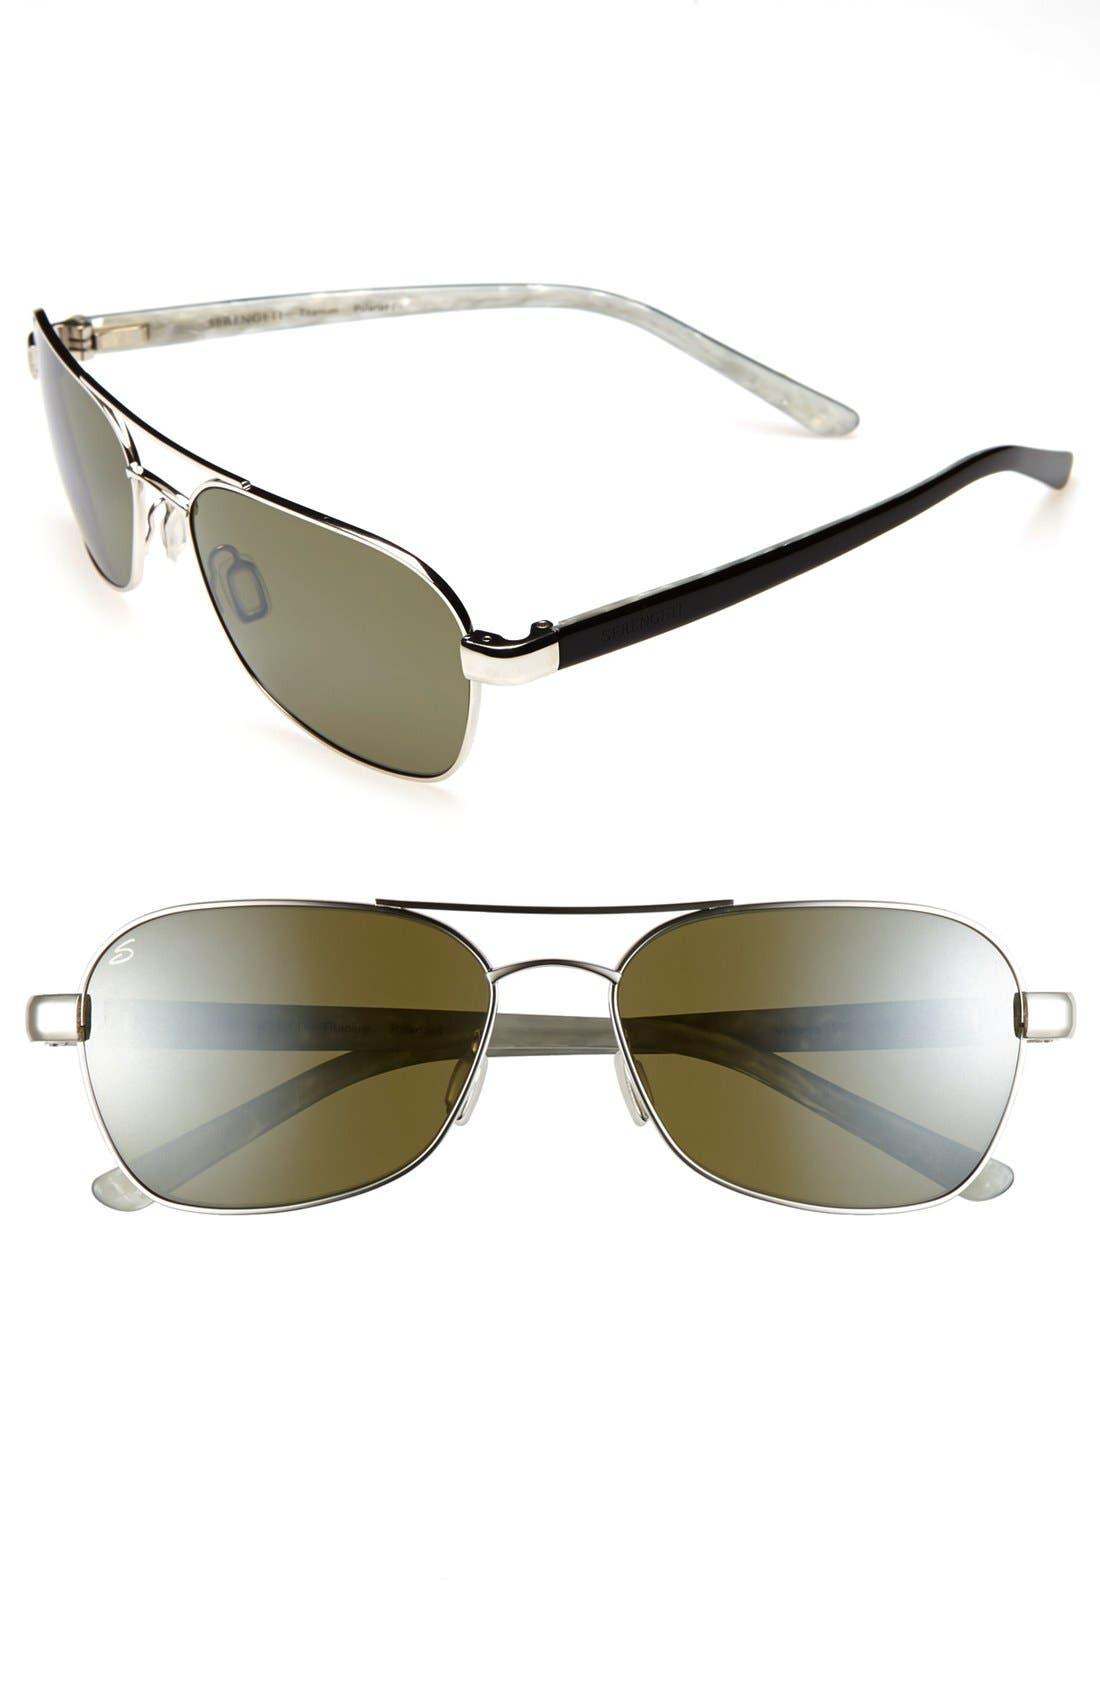 Alternate Image 1 Selected - Serengeti 'Volterra' 61mm Polarized Titanium Sunglasses